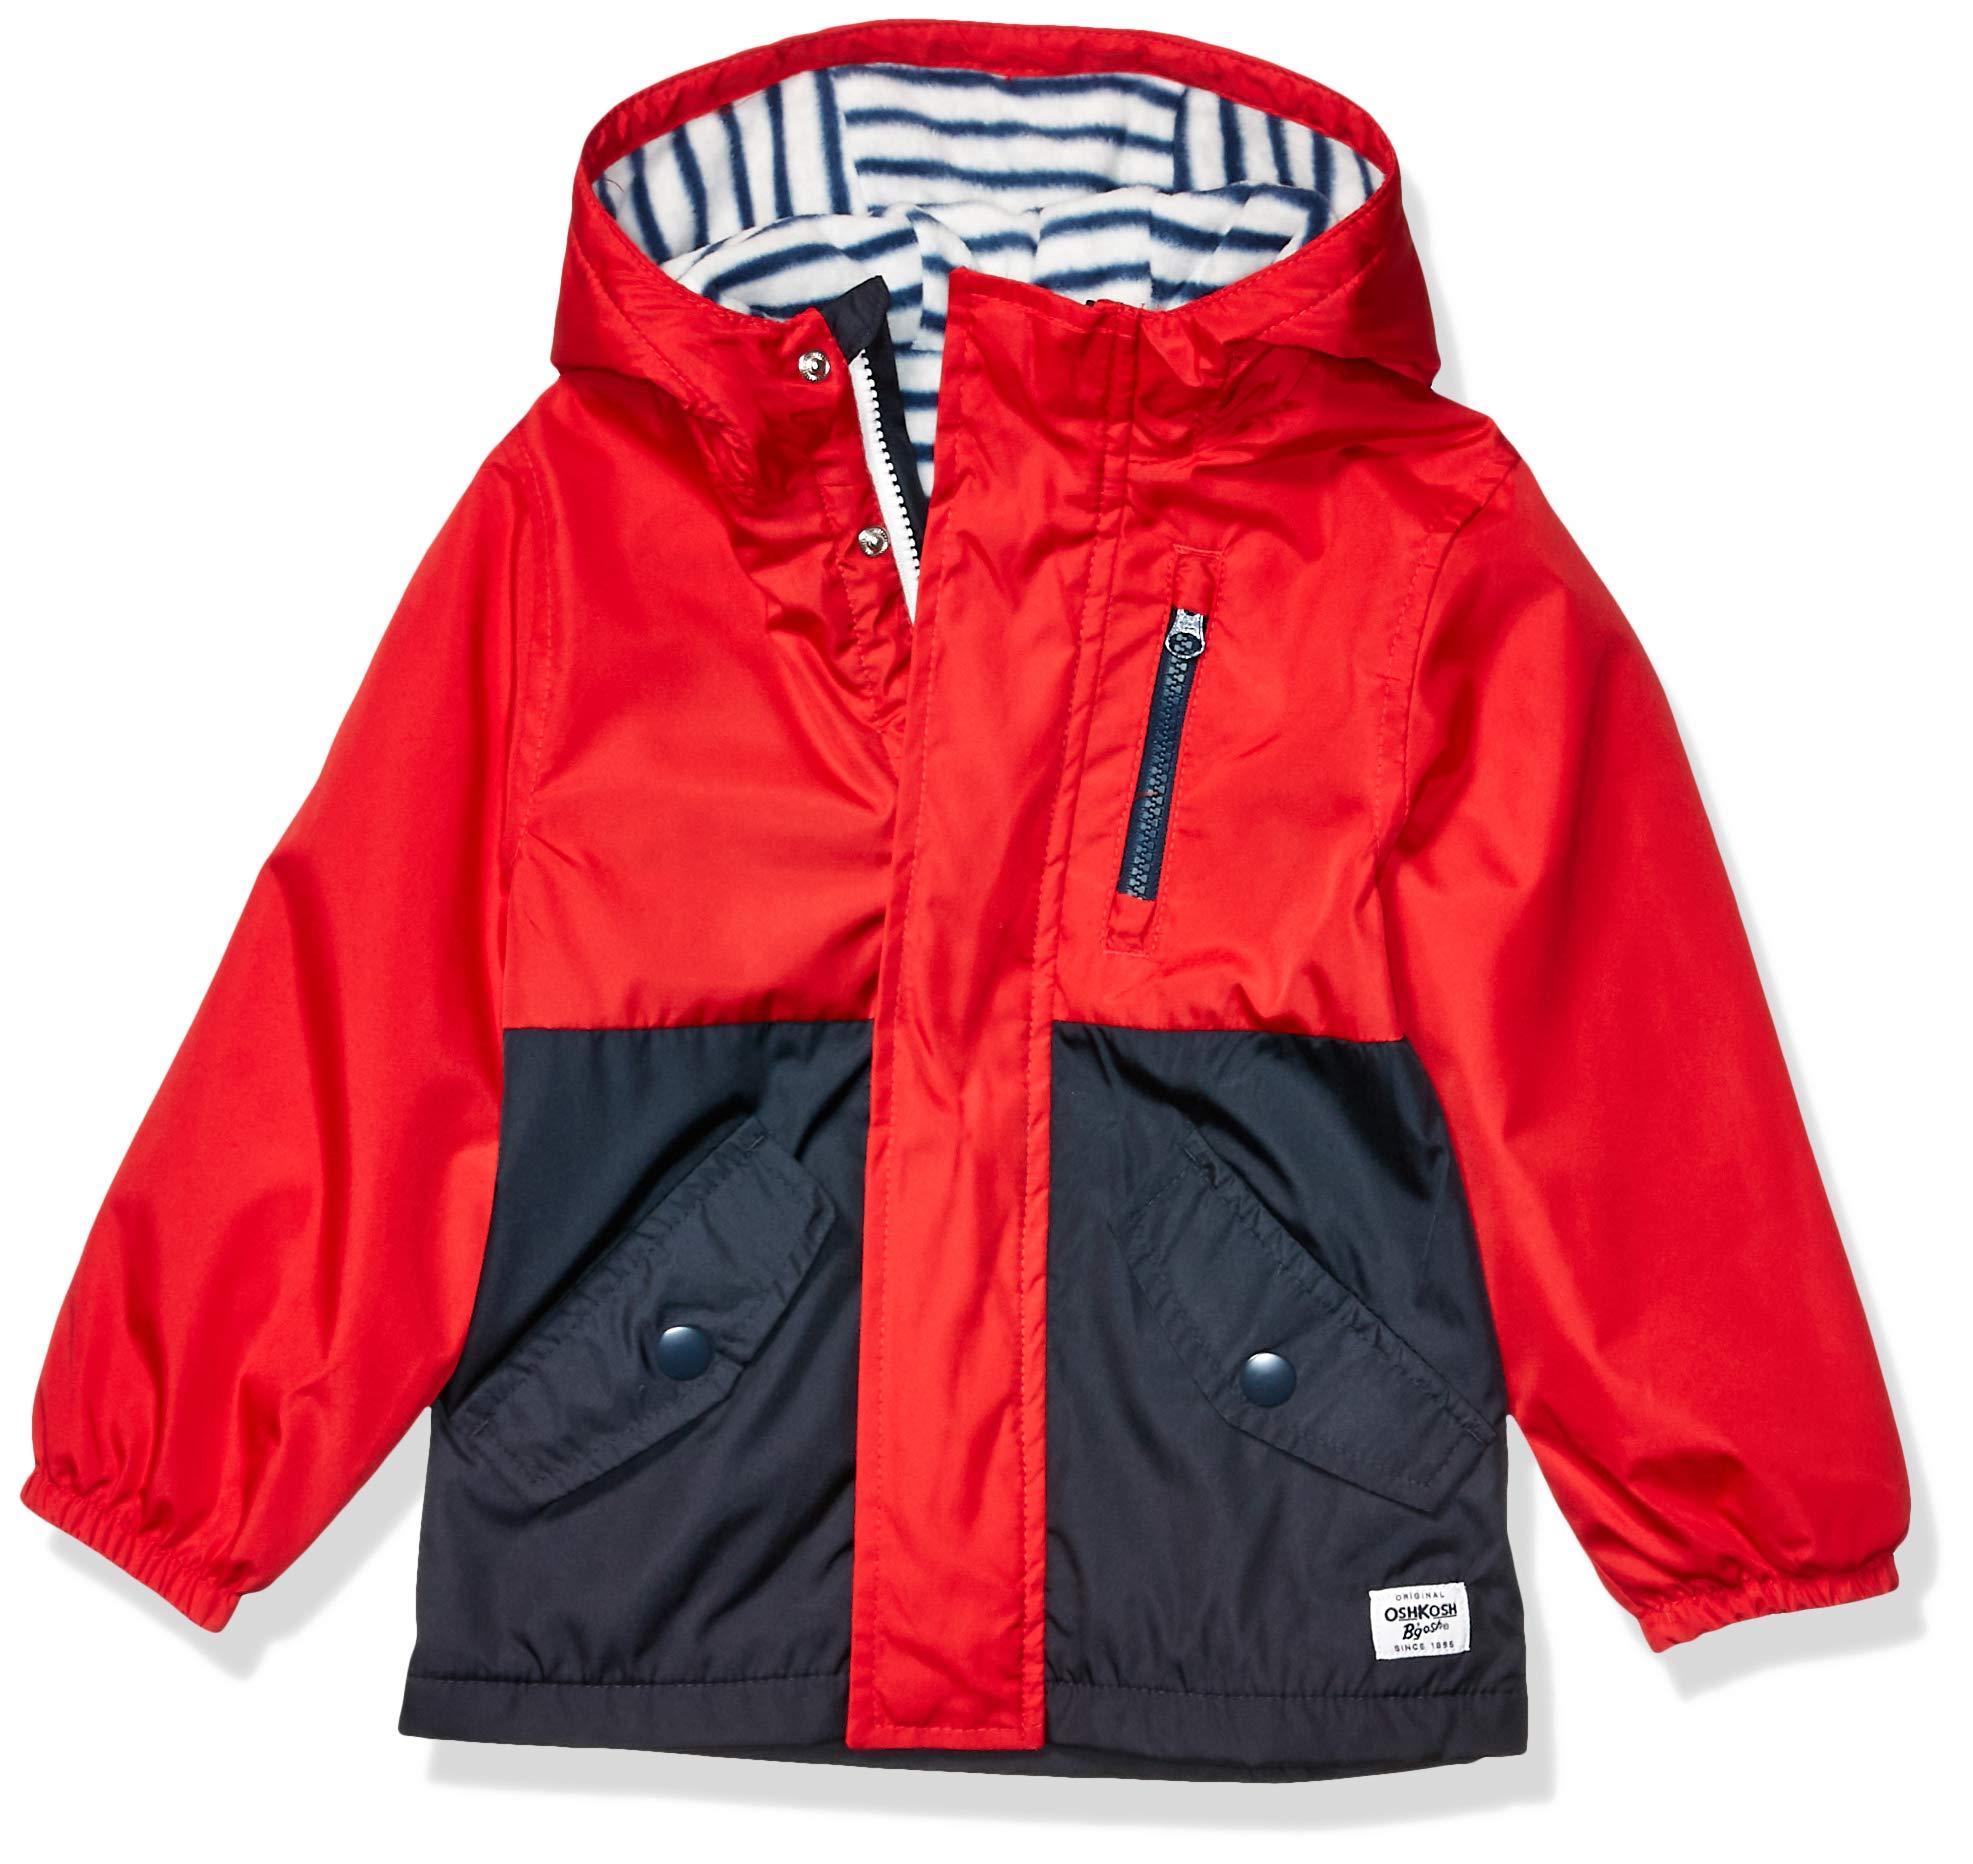 OshKosh B'Gosh Boys' Little Midweight Fleece Lined Windbreaker Jacket, Red Black Blocked, 4